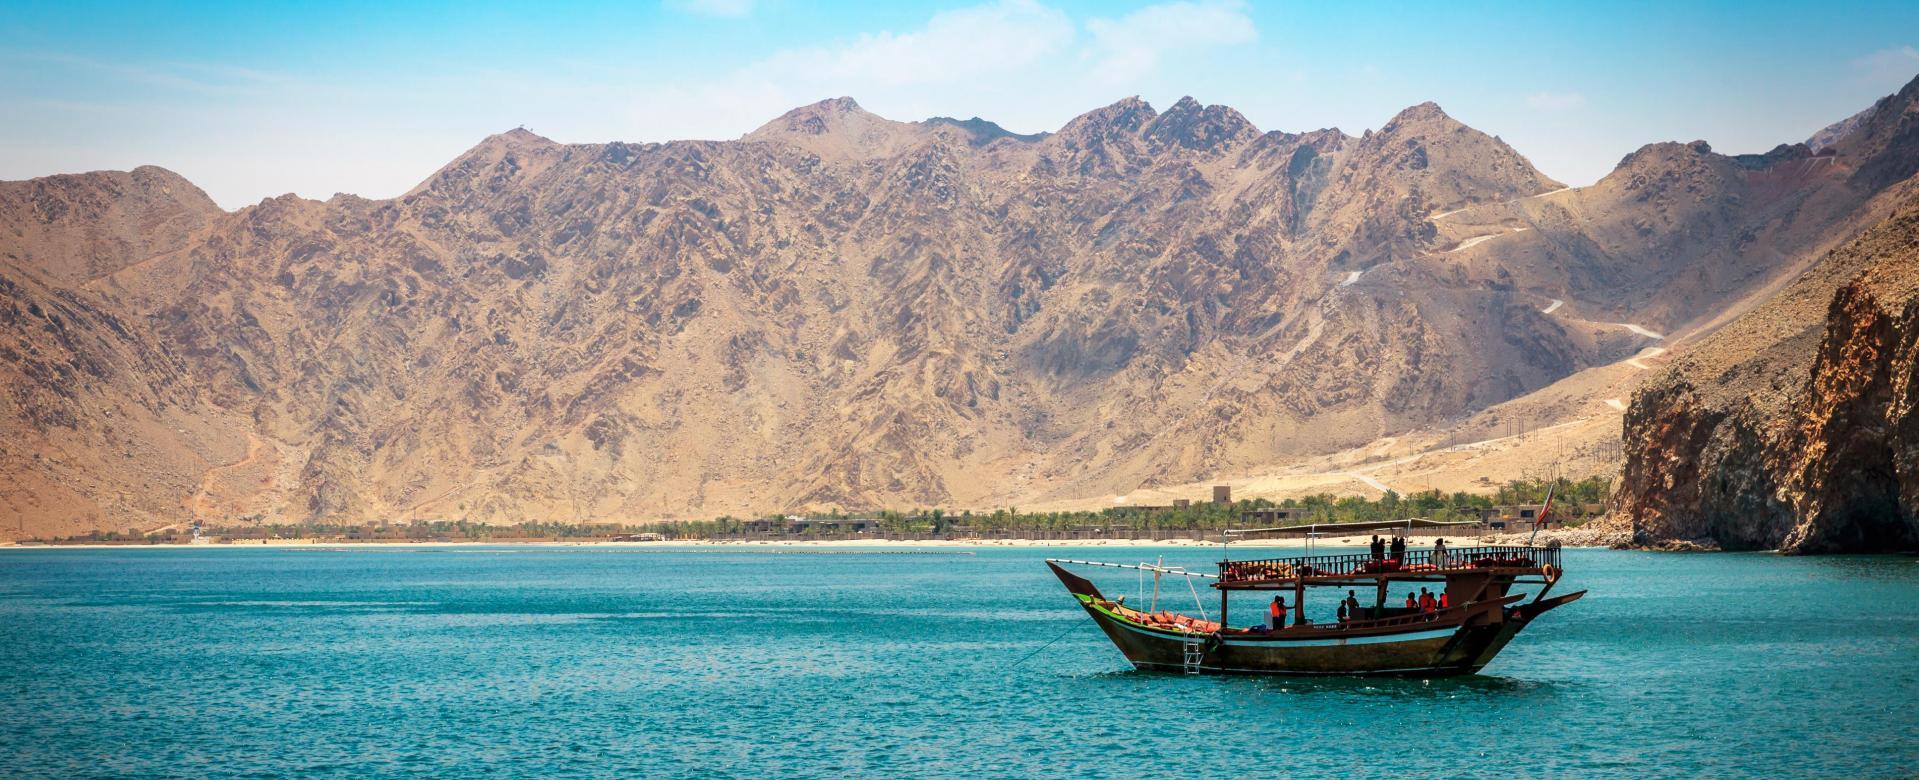 Voyage à pied Oman : Marins du musandam